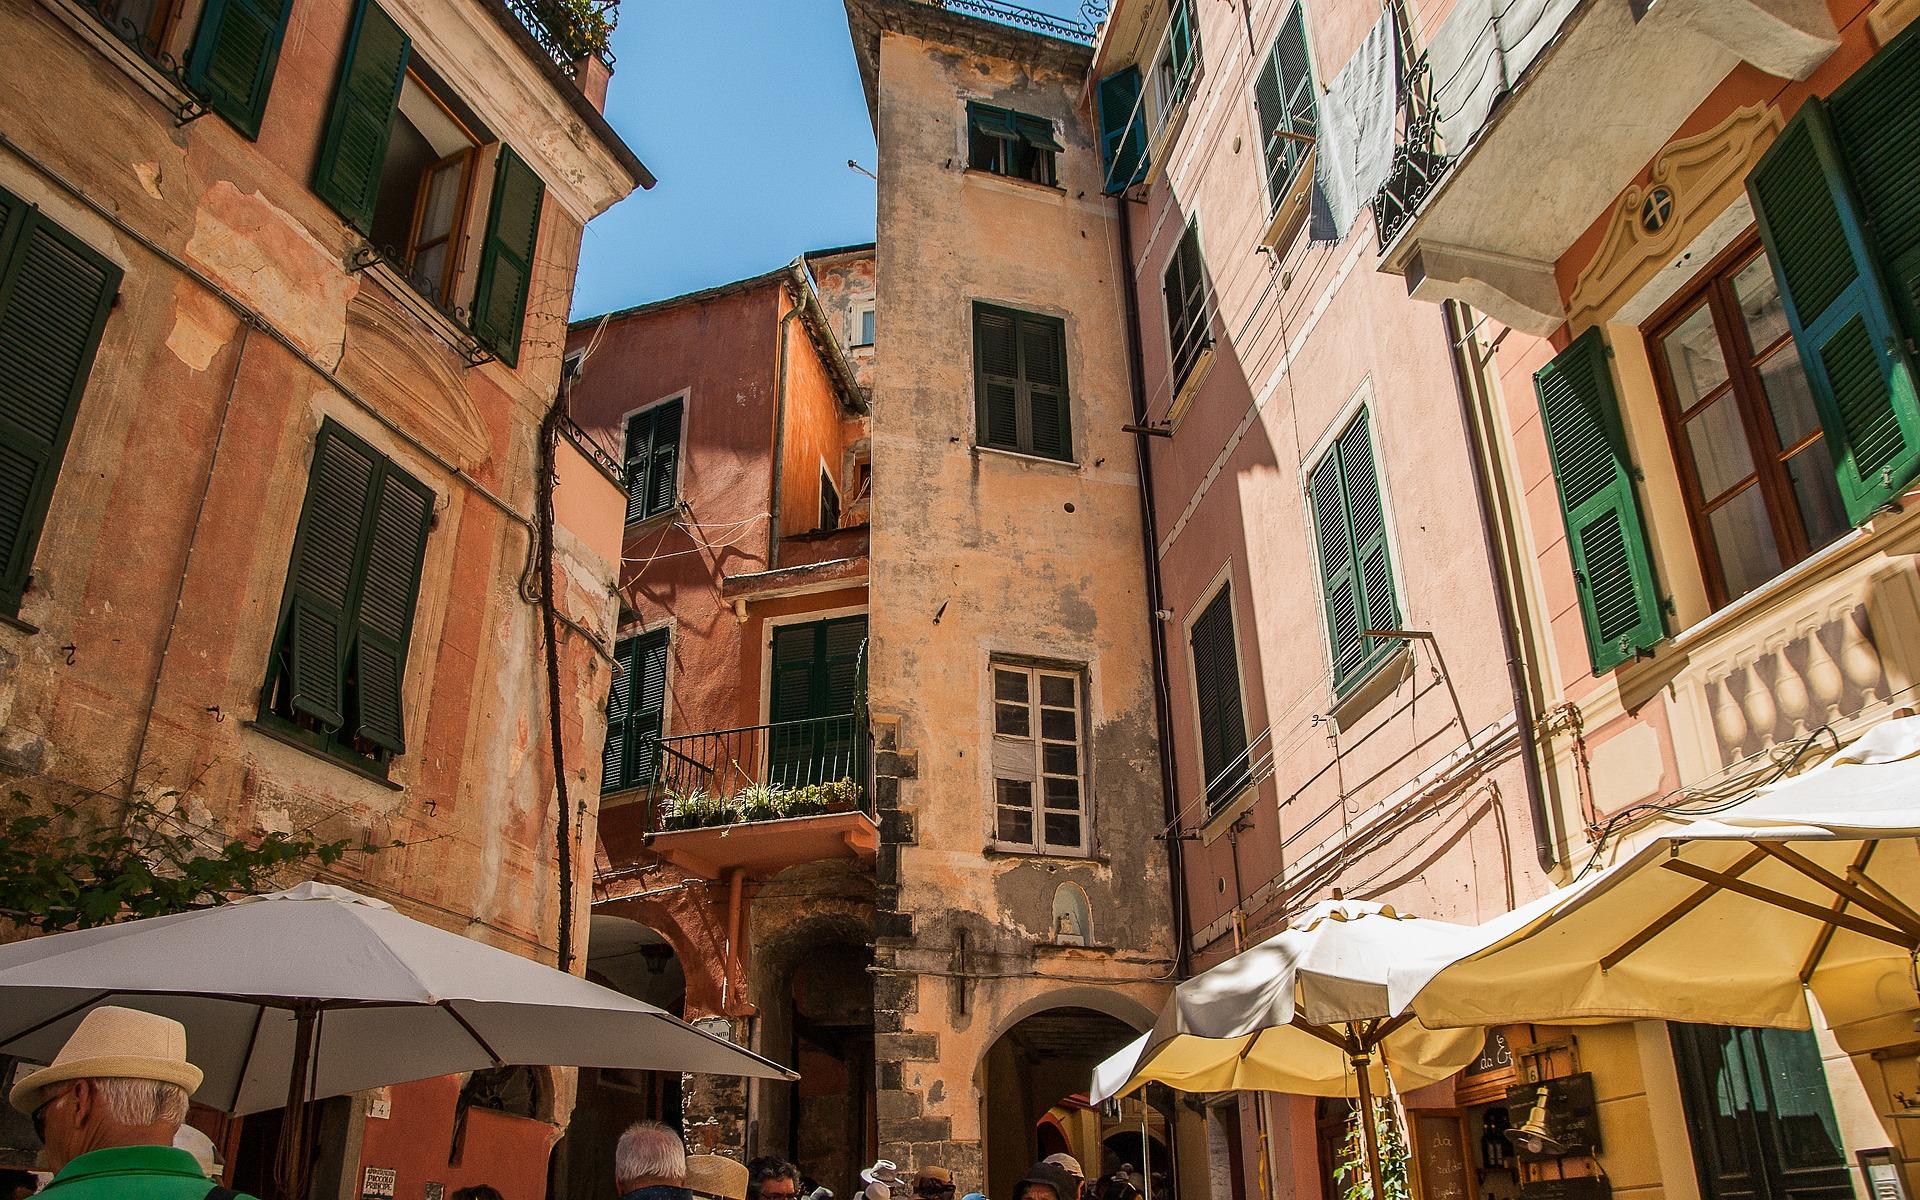 Monterosso_CC0.jpg?1545745733